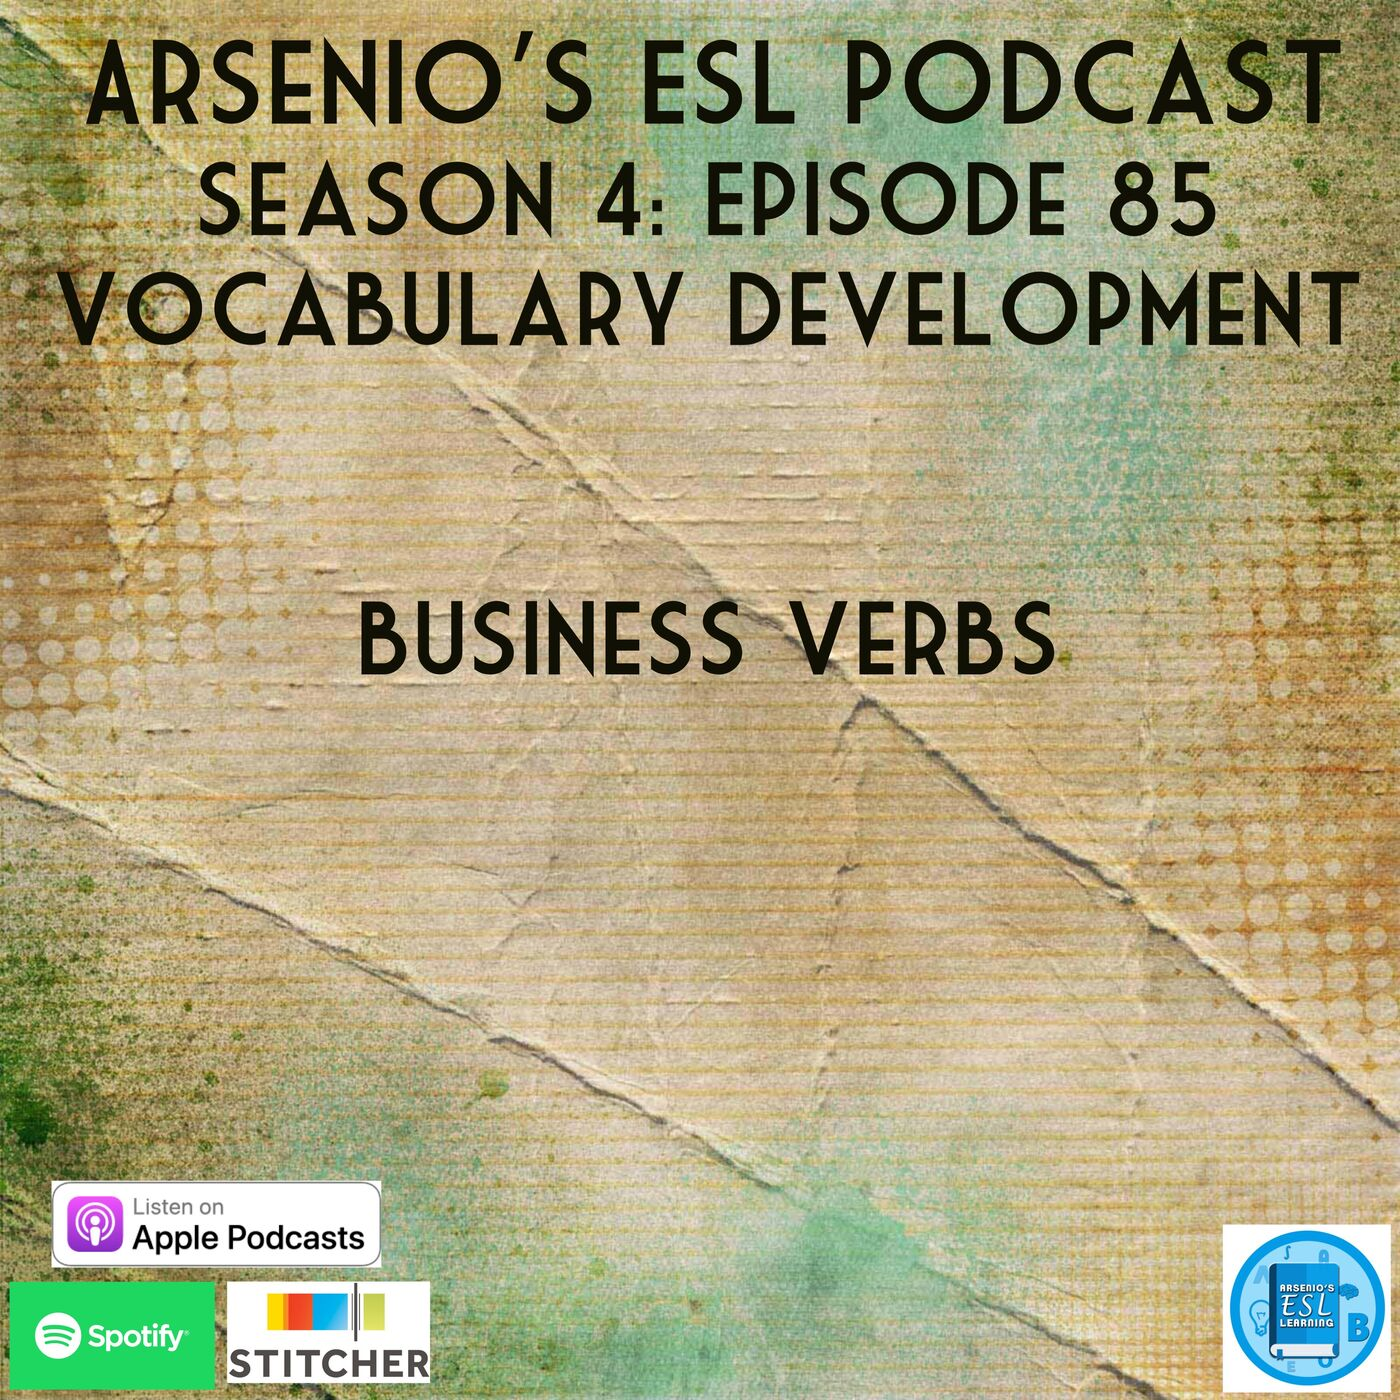 Arsenio's ESL Podcast: Season 4 - Episode 85 - Vocabulary Development - Business Verbs